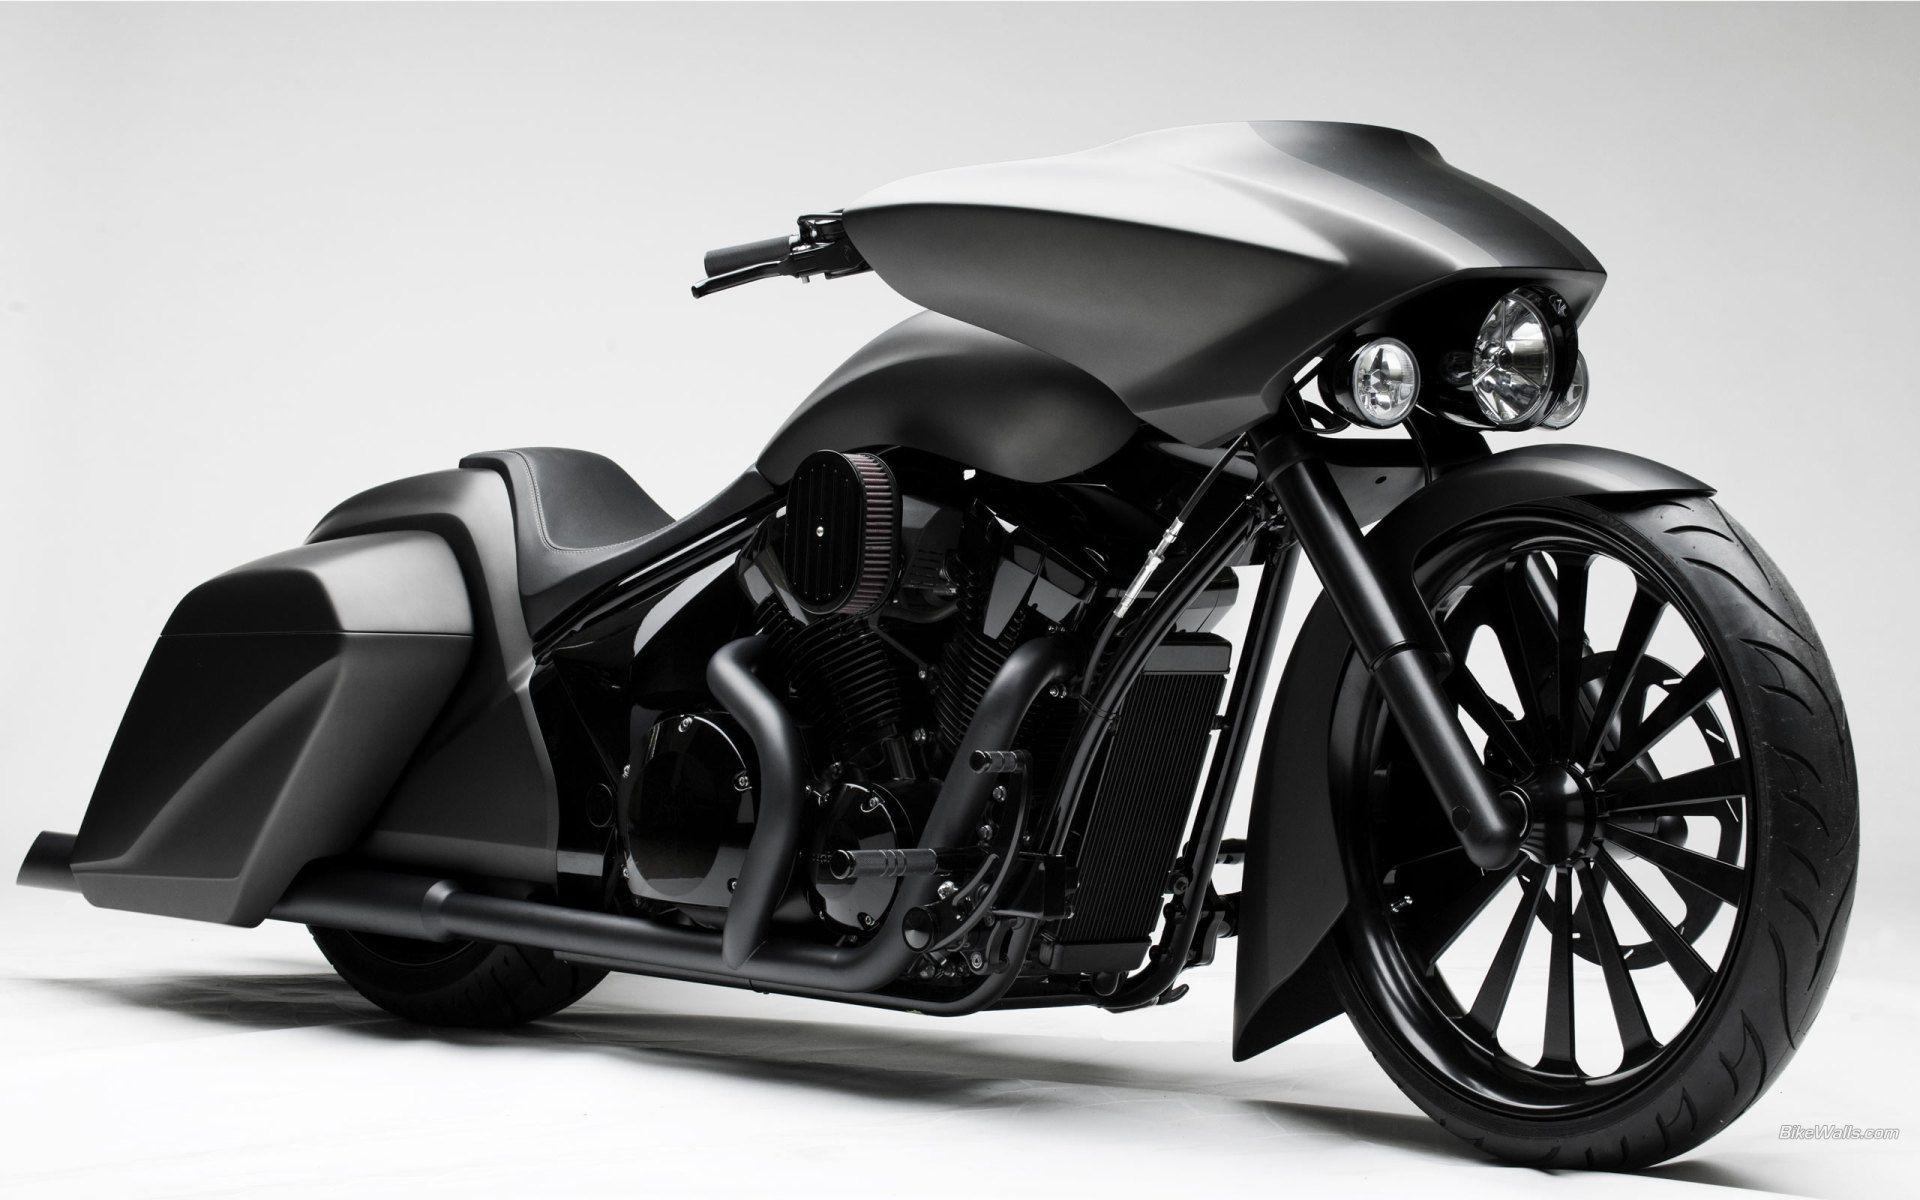 Harley Davidson Sportster Custom Wallpaper: Desktop HD Wallpaper ...